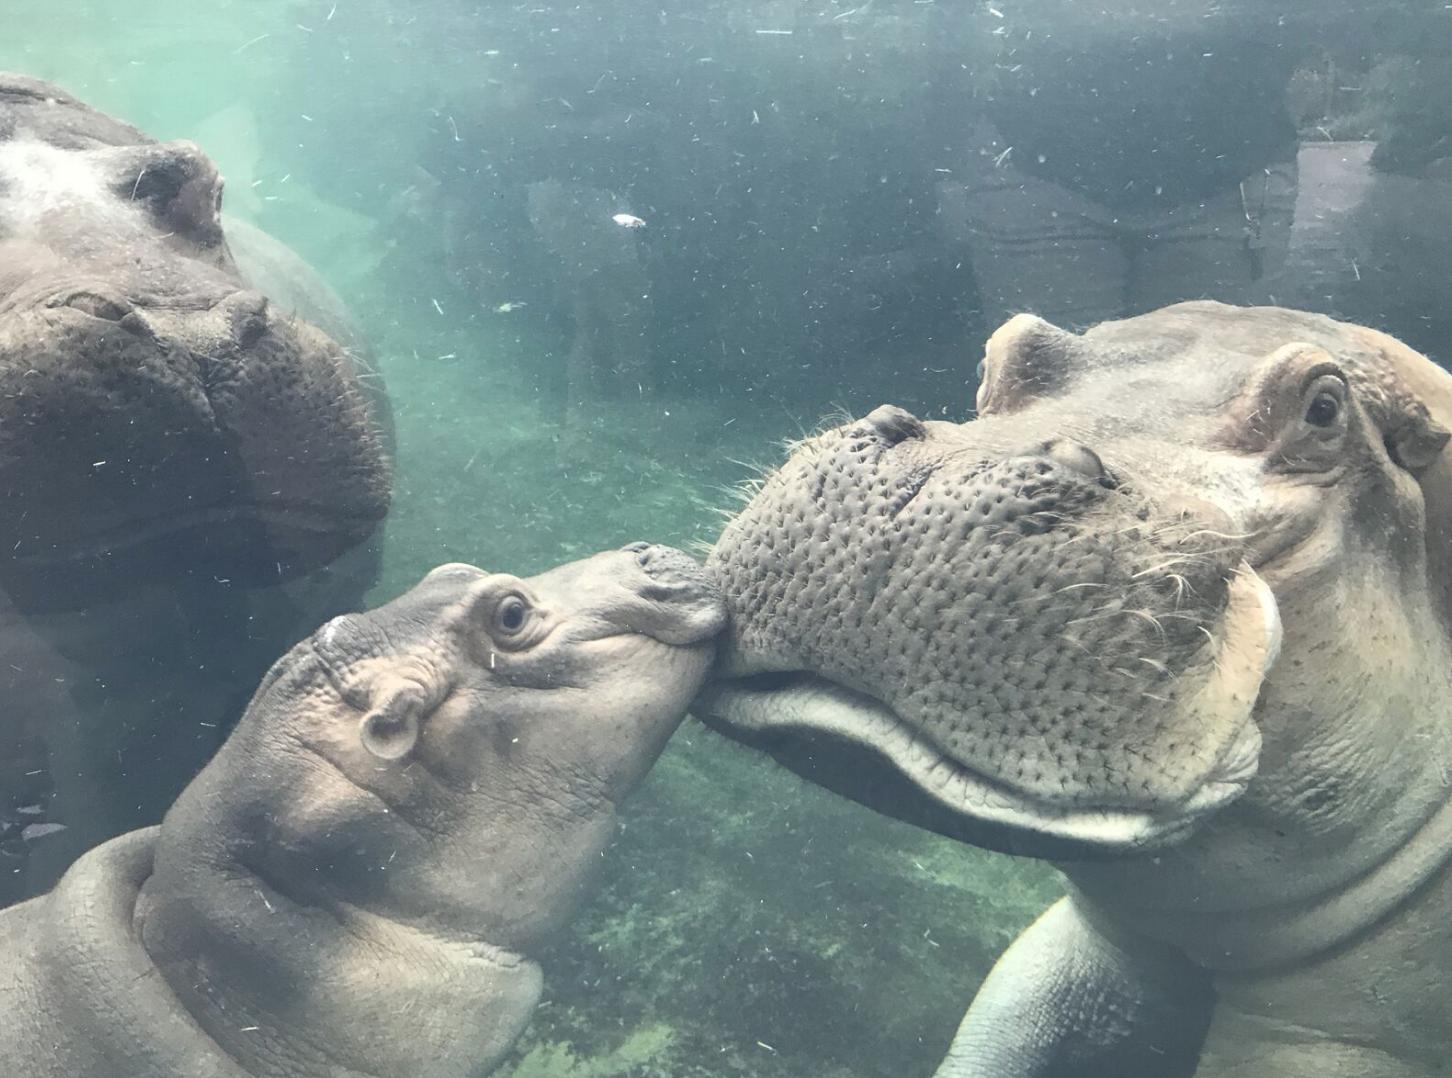 Photo via the Cincinnati Zoo Blog